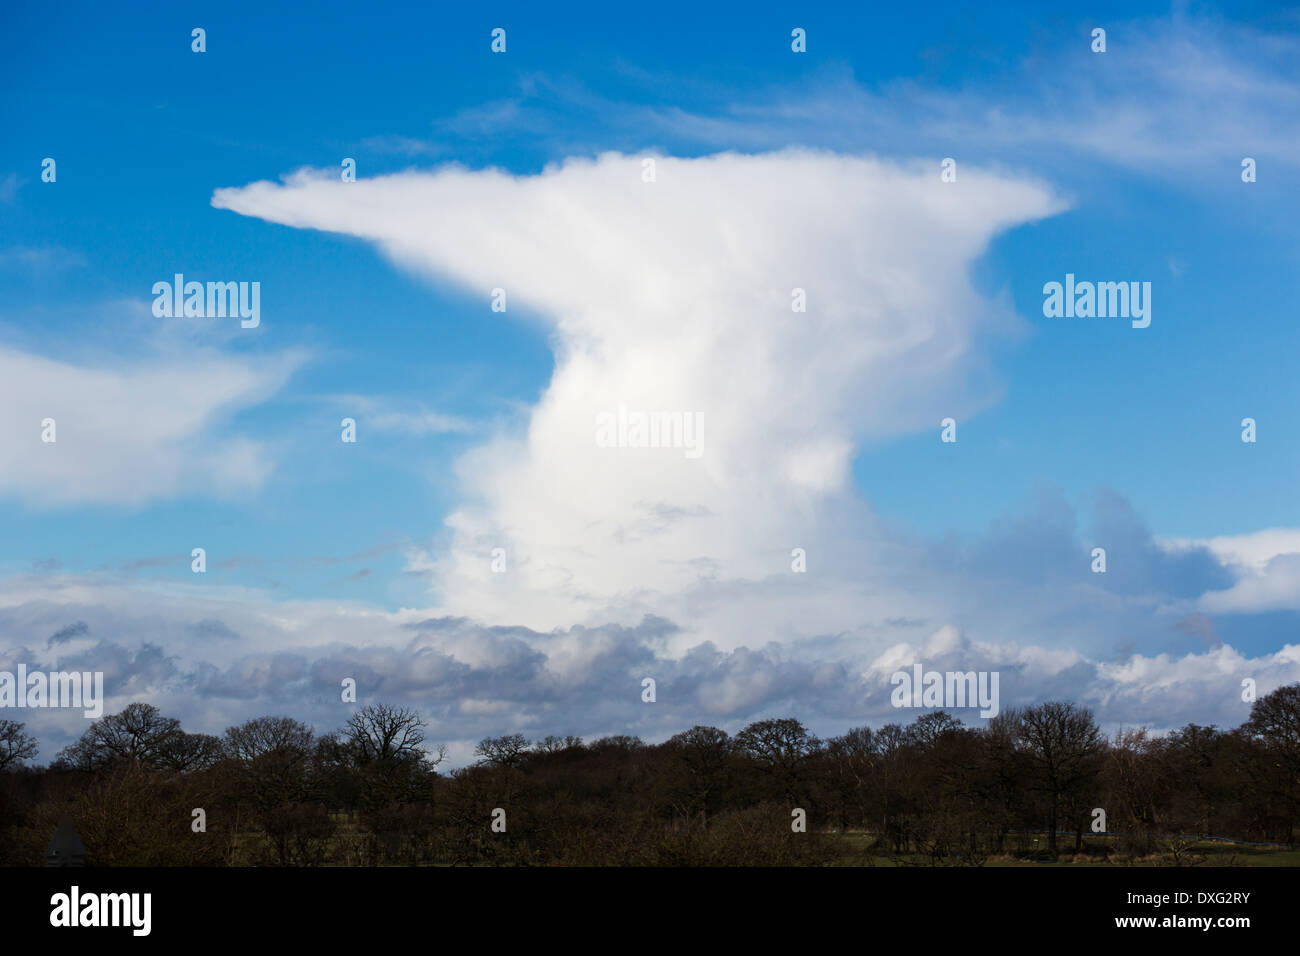 A typical cumulonimbus or anvil cloud over Birmingham, UK Stock Photo